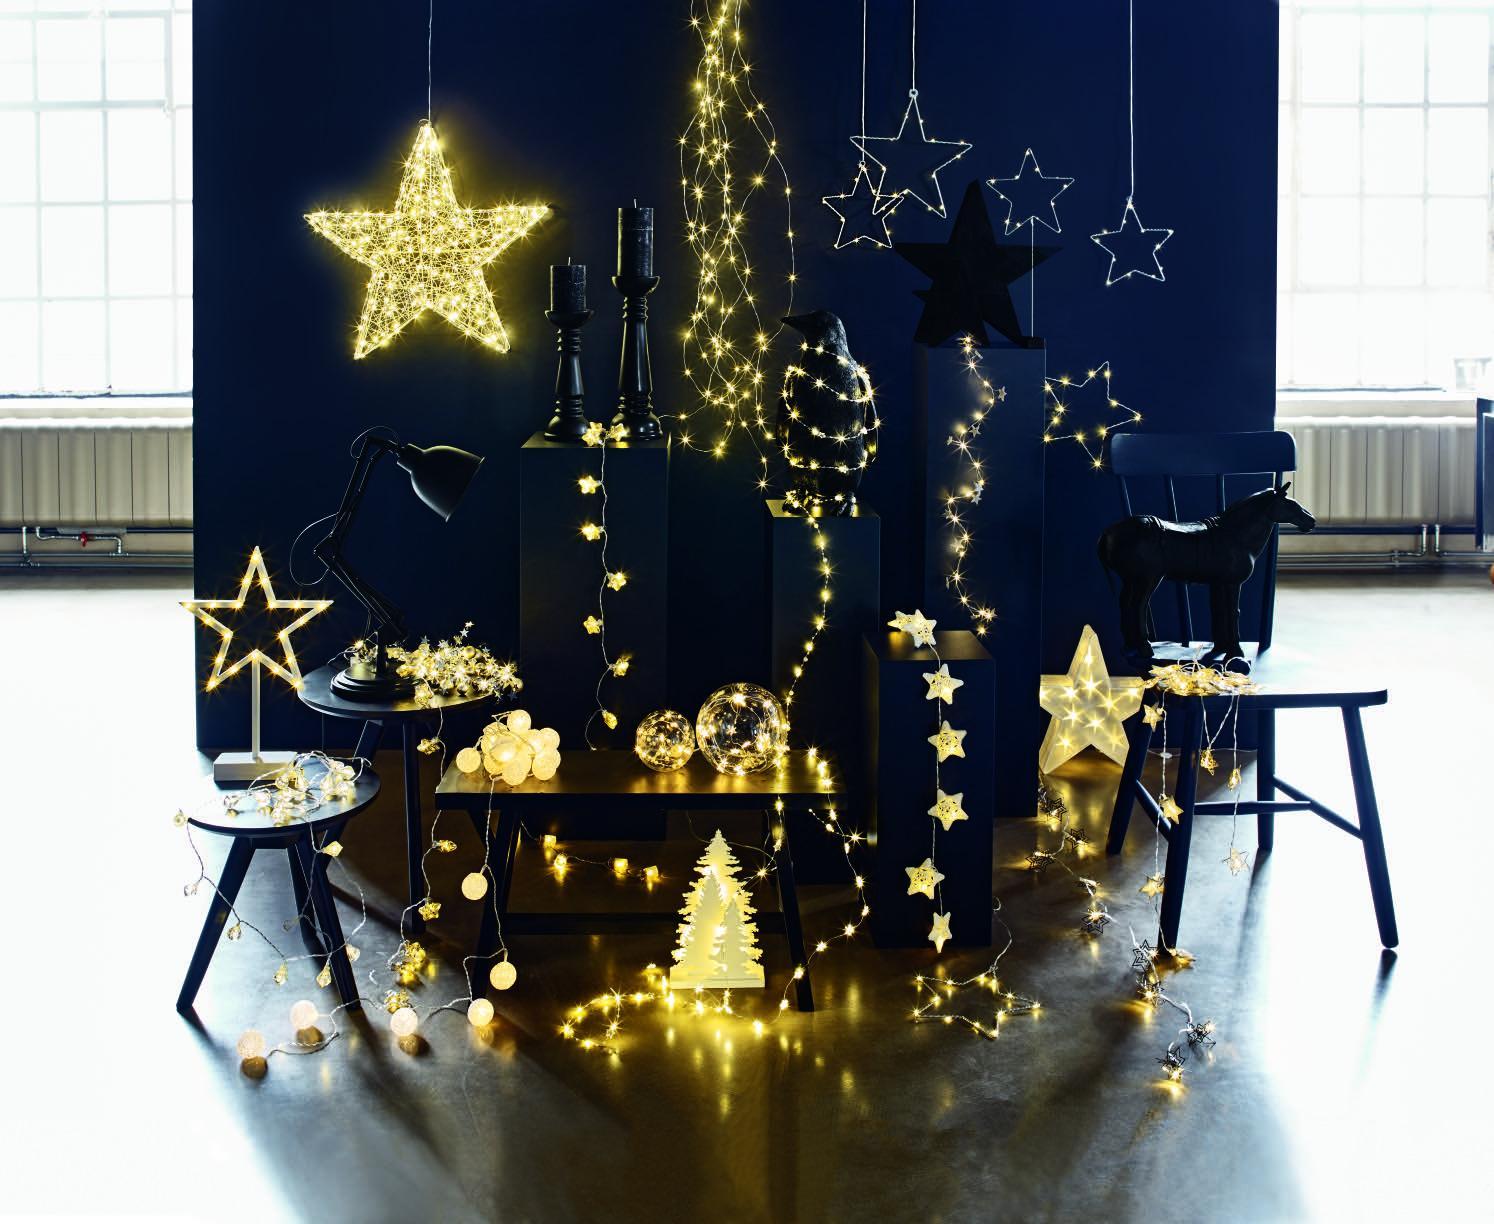 Depot Weihnachtsbeleuchtung.Weihnachtsbeleuchtung Von Deopt Beleuchtung Weihna